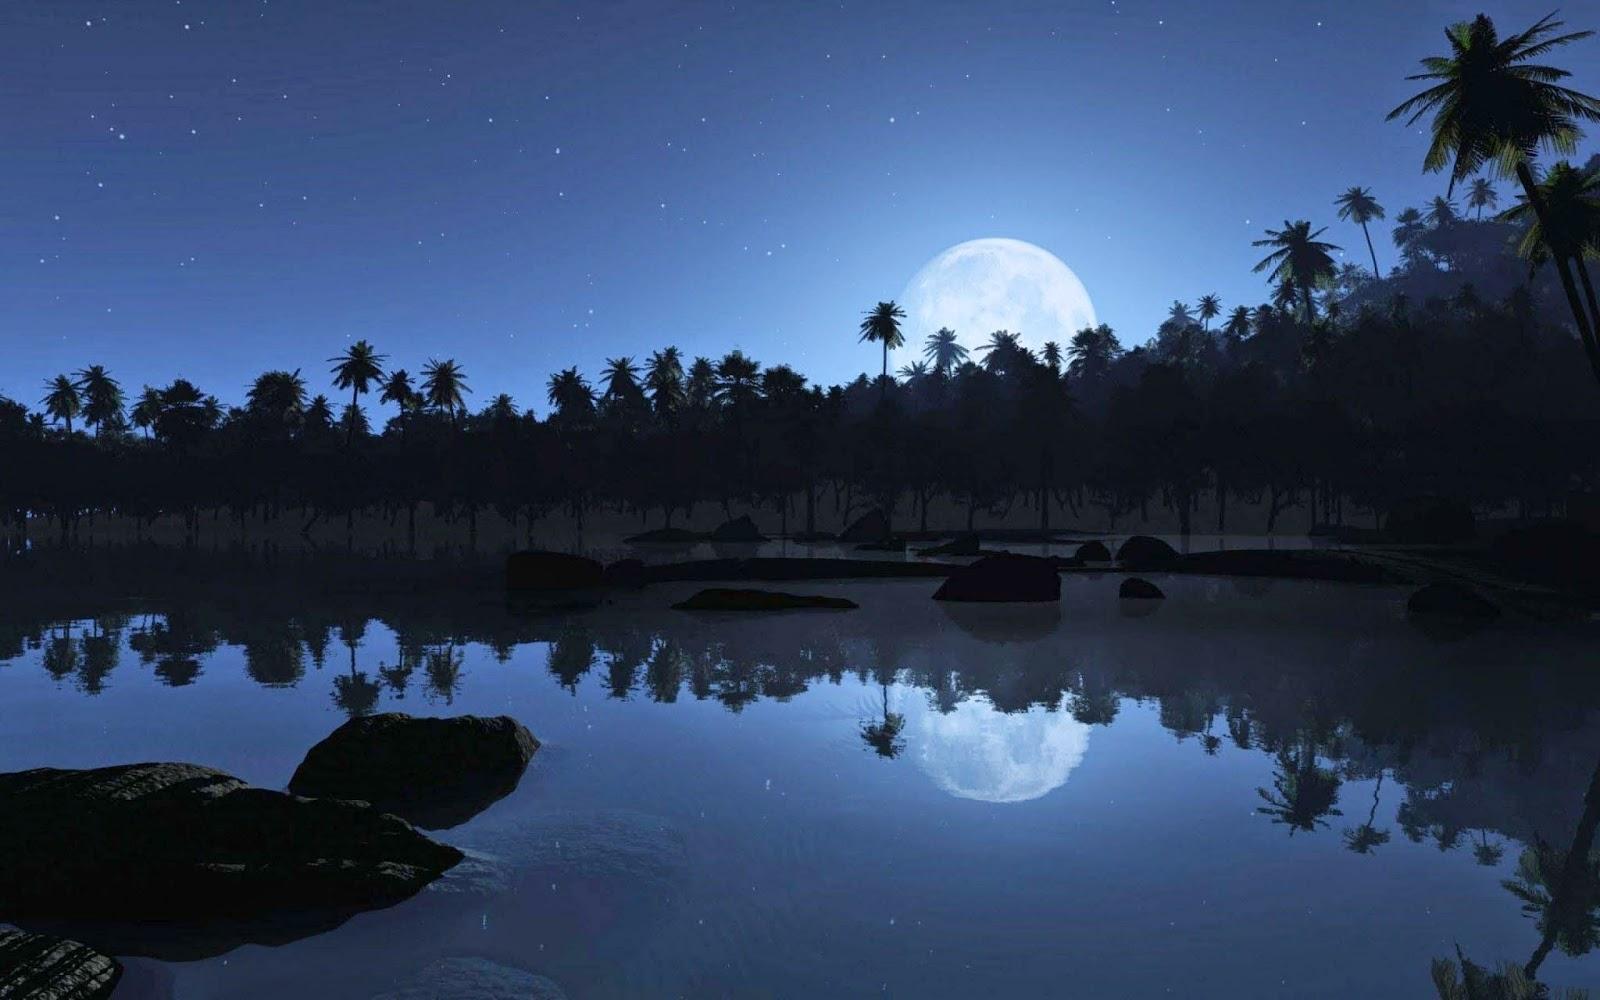 night-sweet-dreams-reflaction-wallpapers